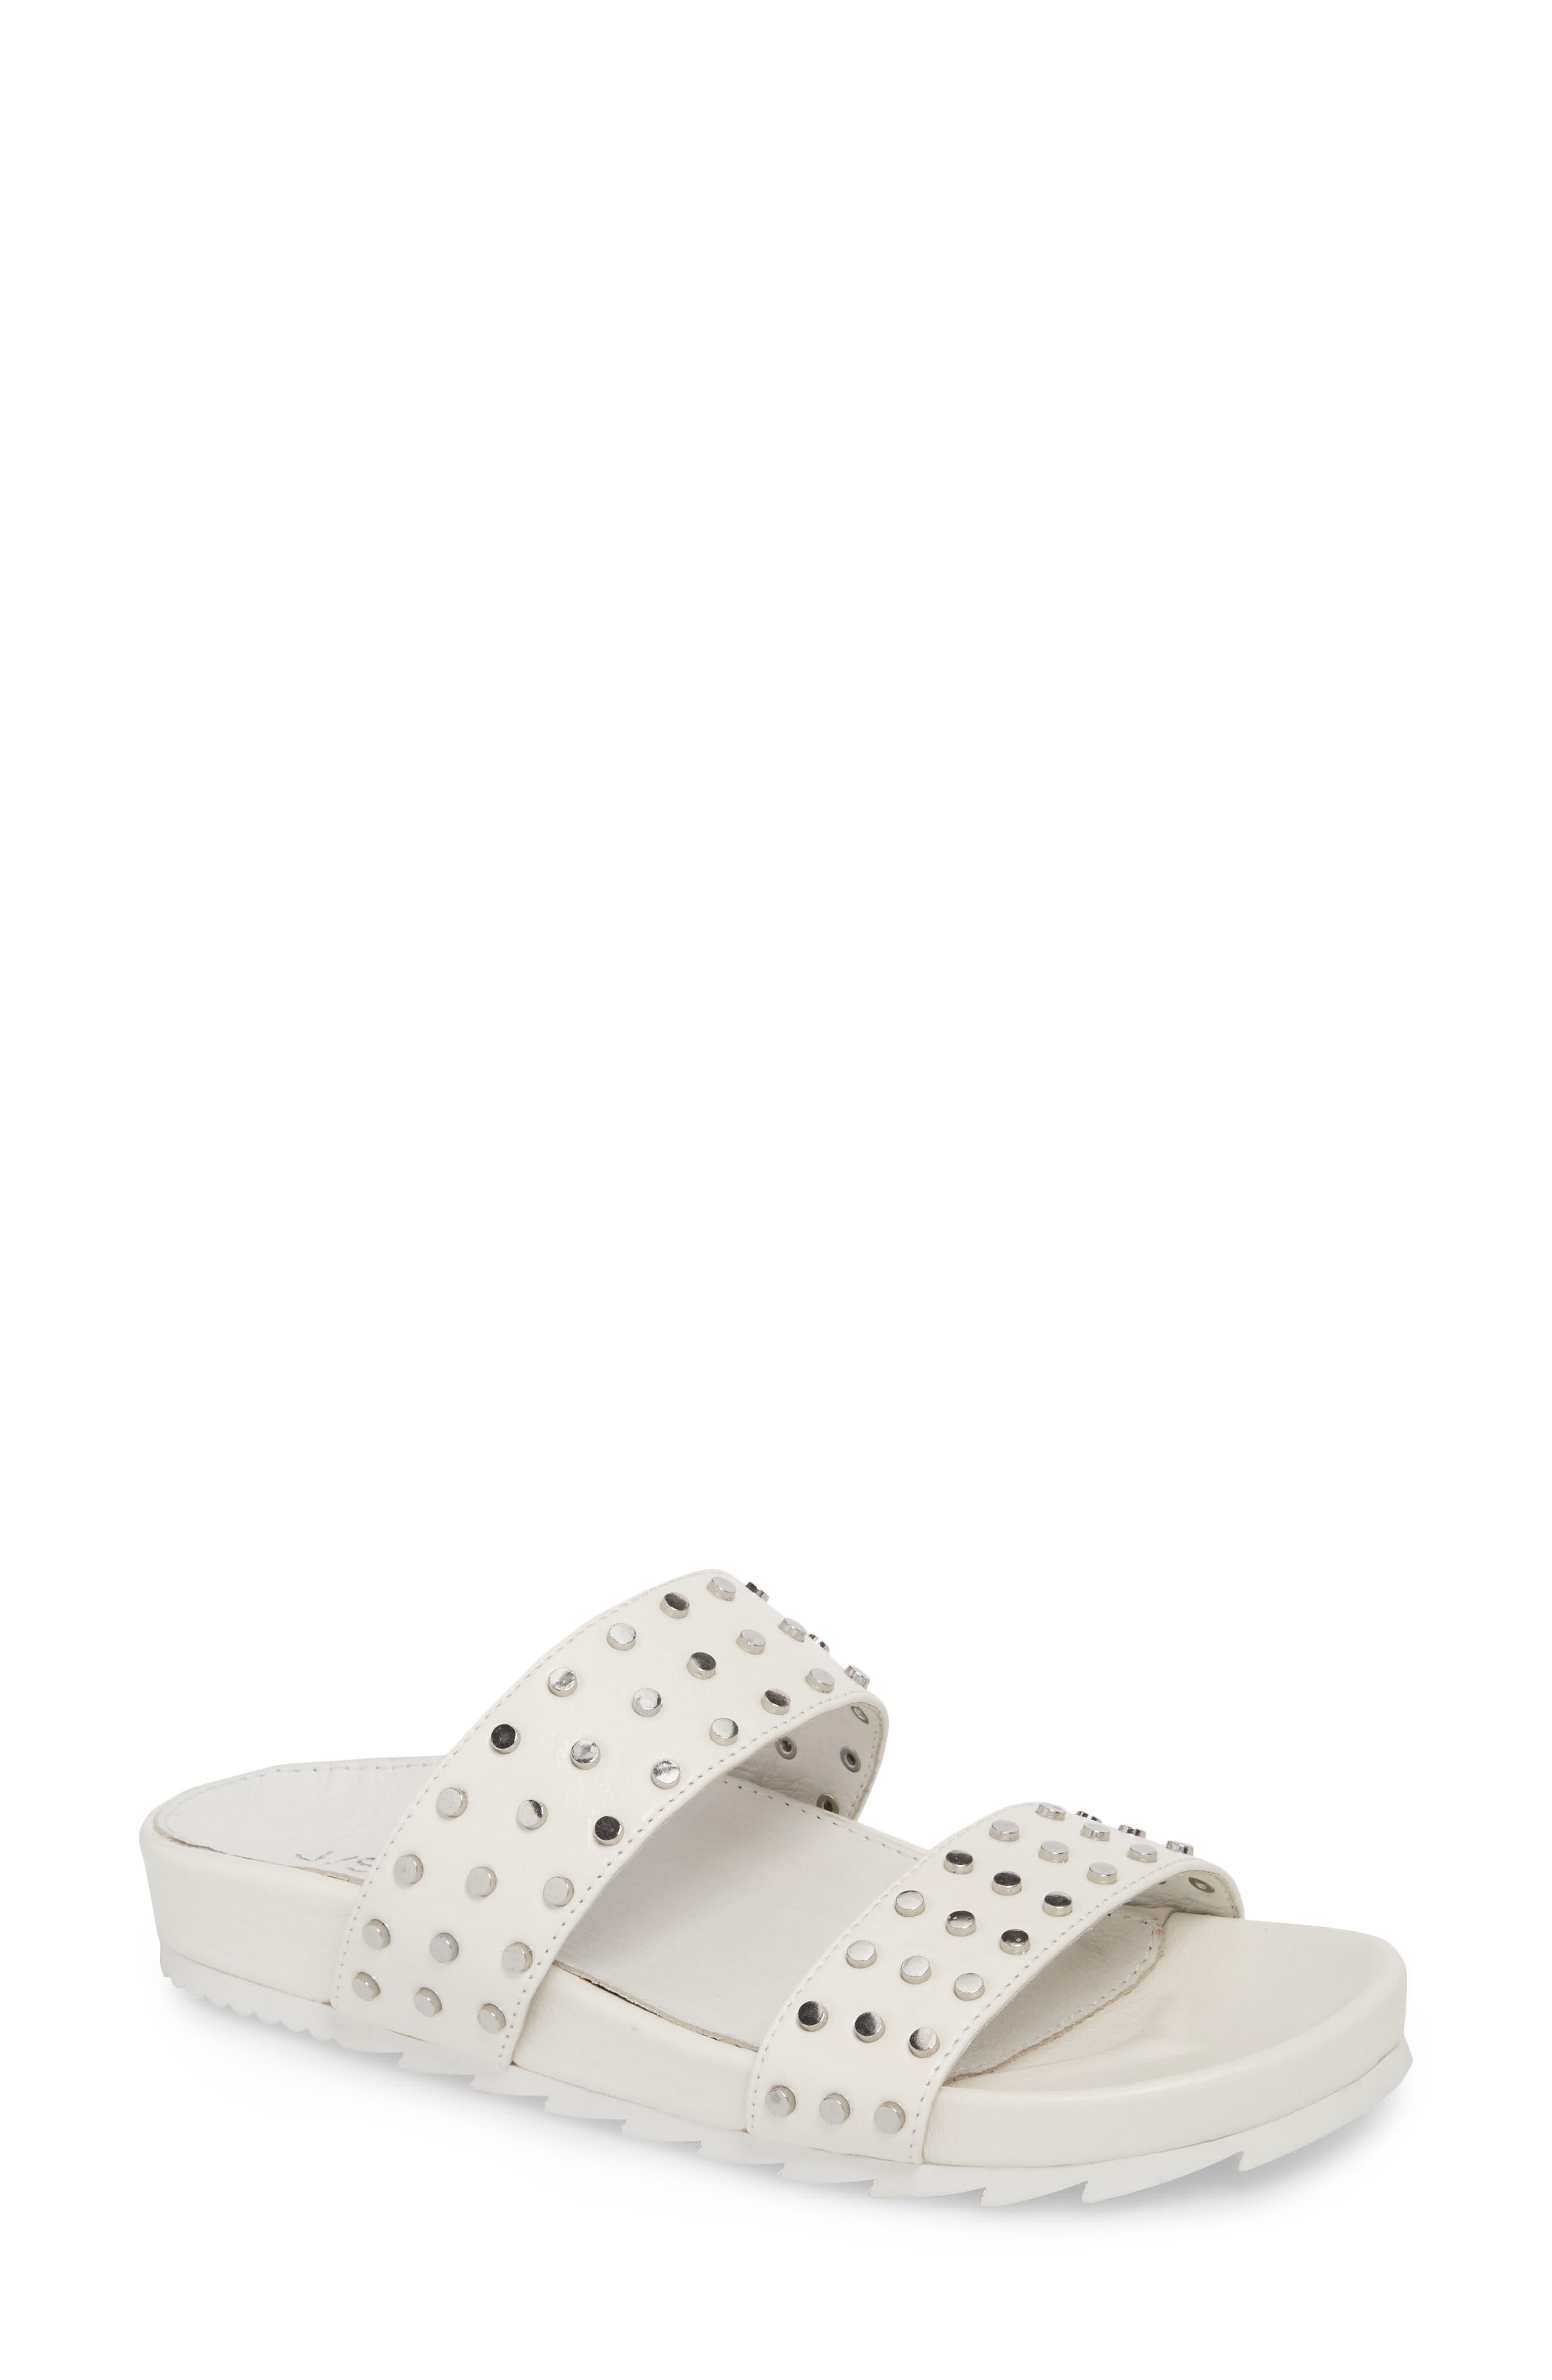 Erika Studded Slide Sandal,                         Main,                         color, WHITE LEATHER